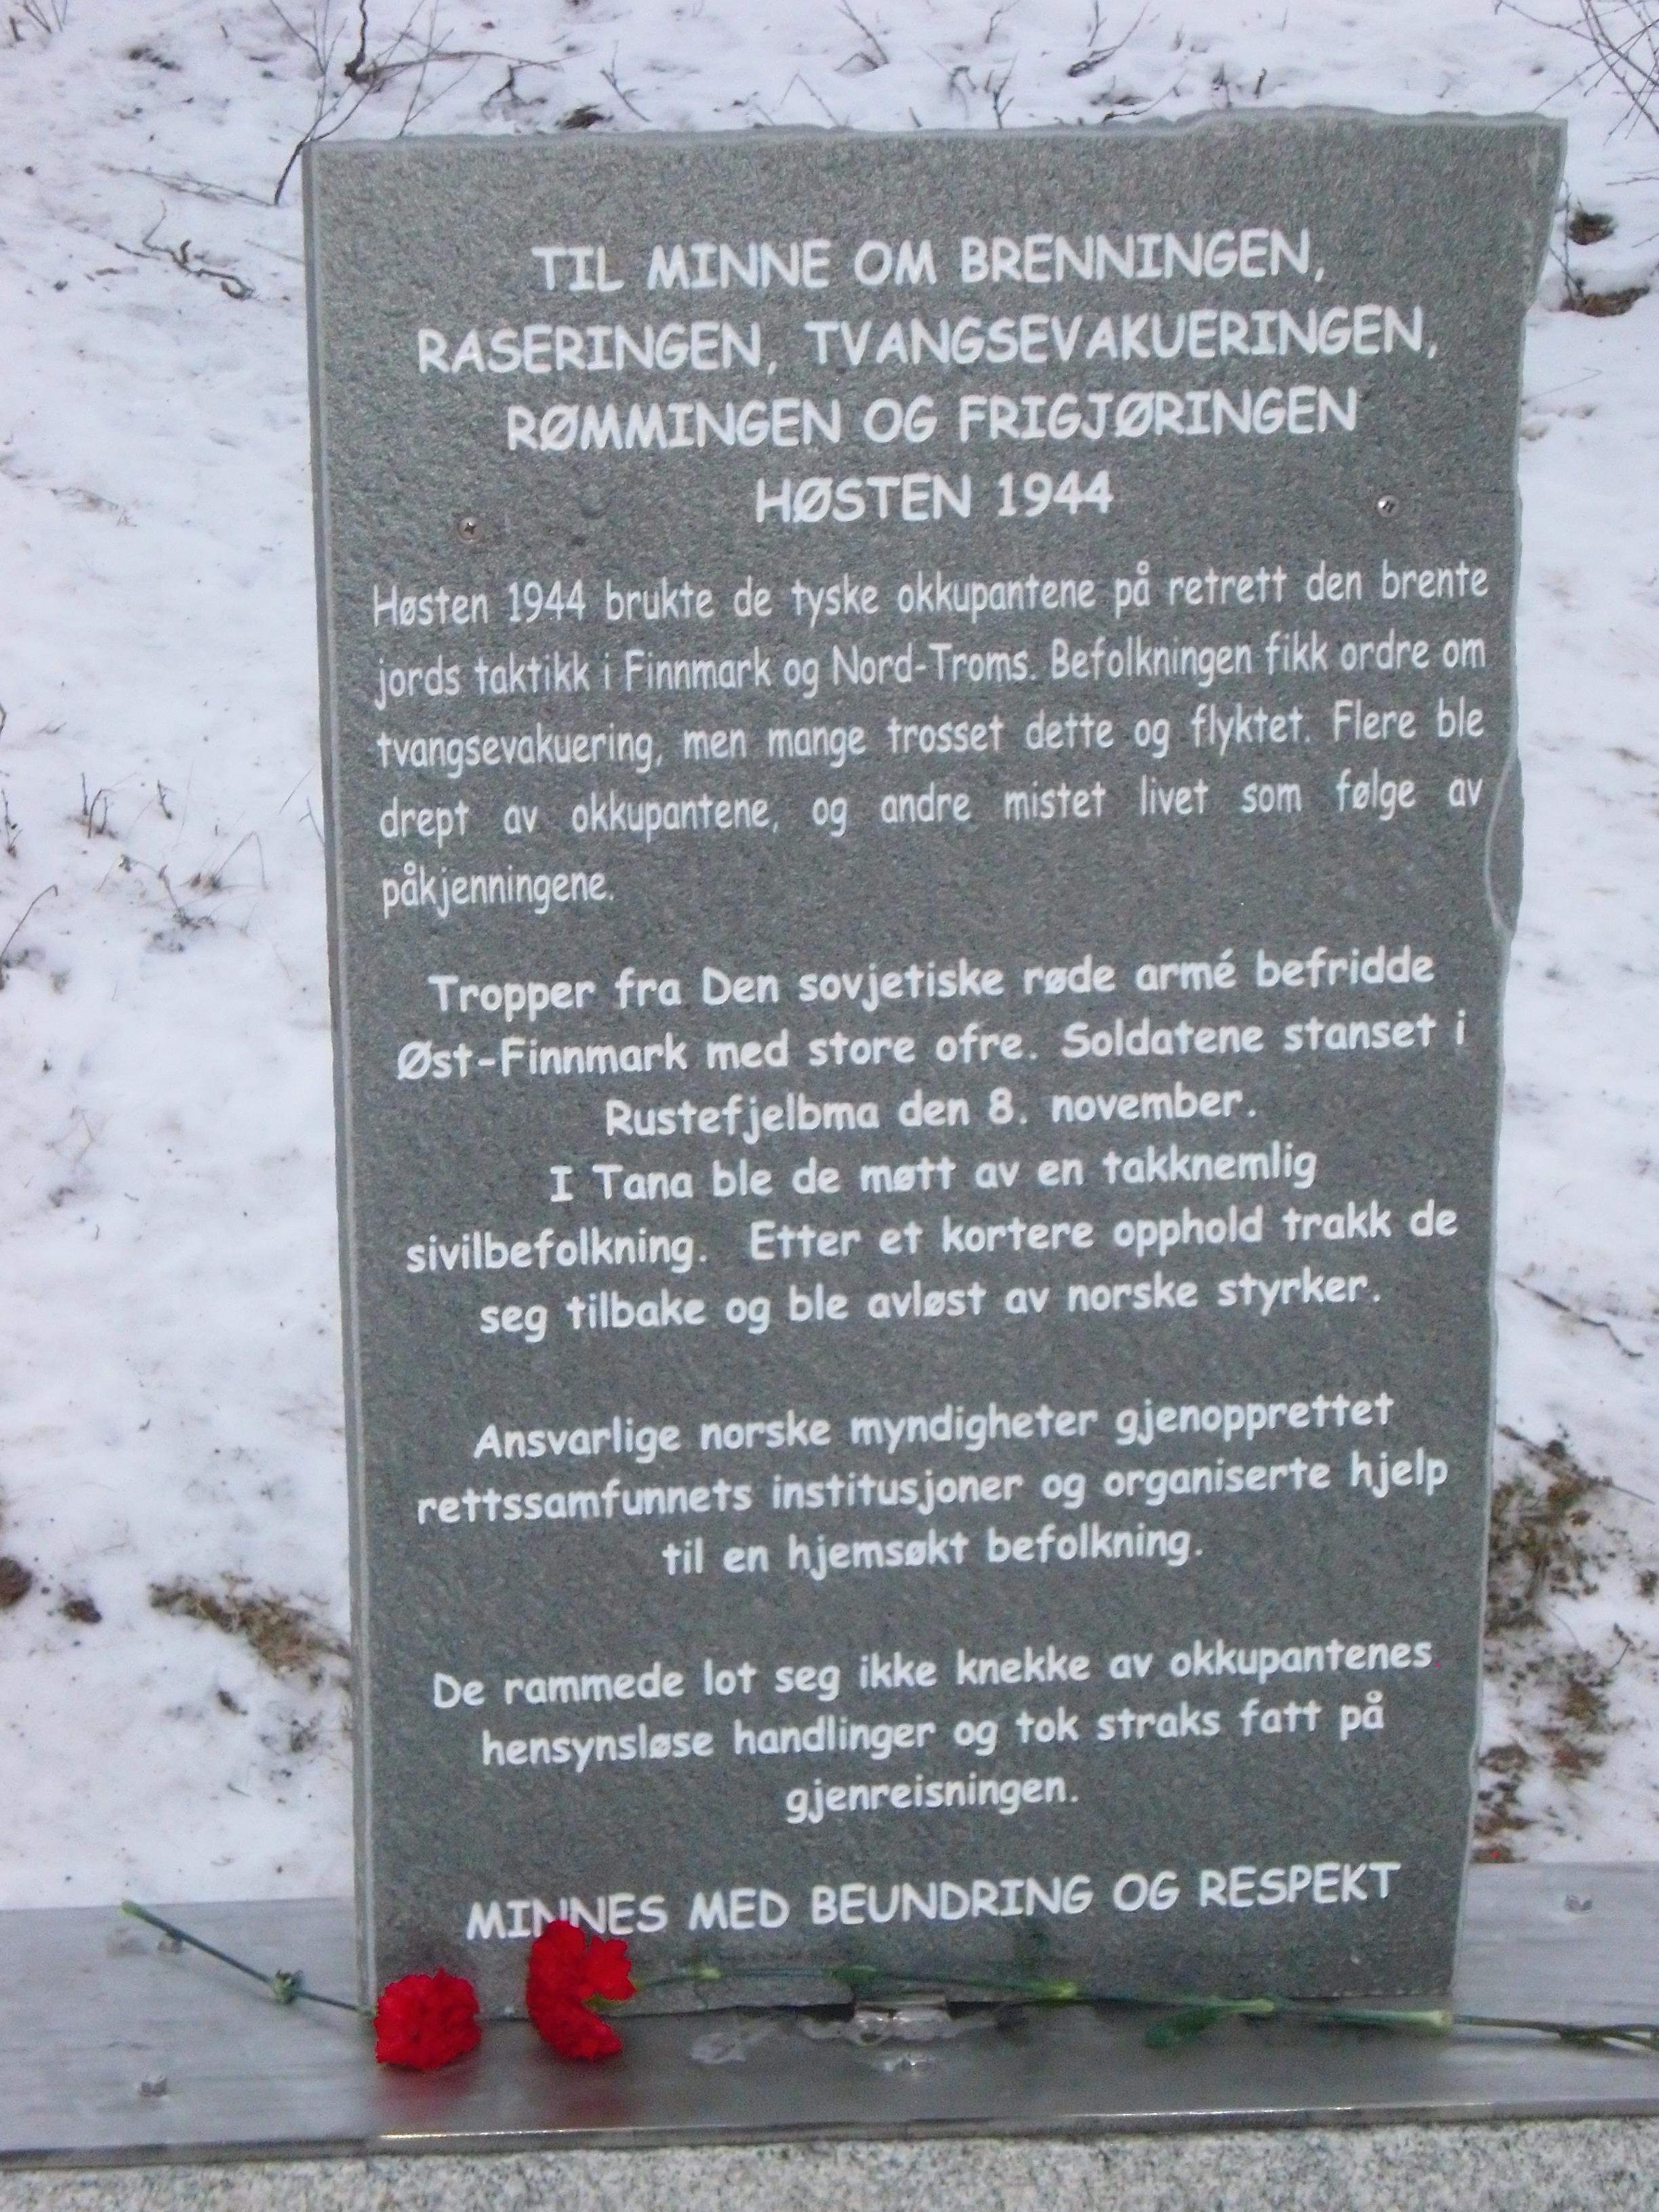 Minneteksten på norsk.